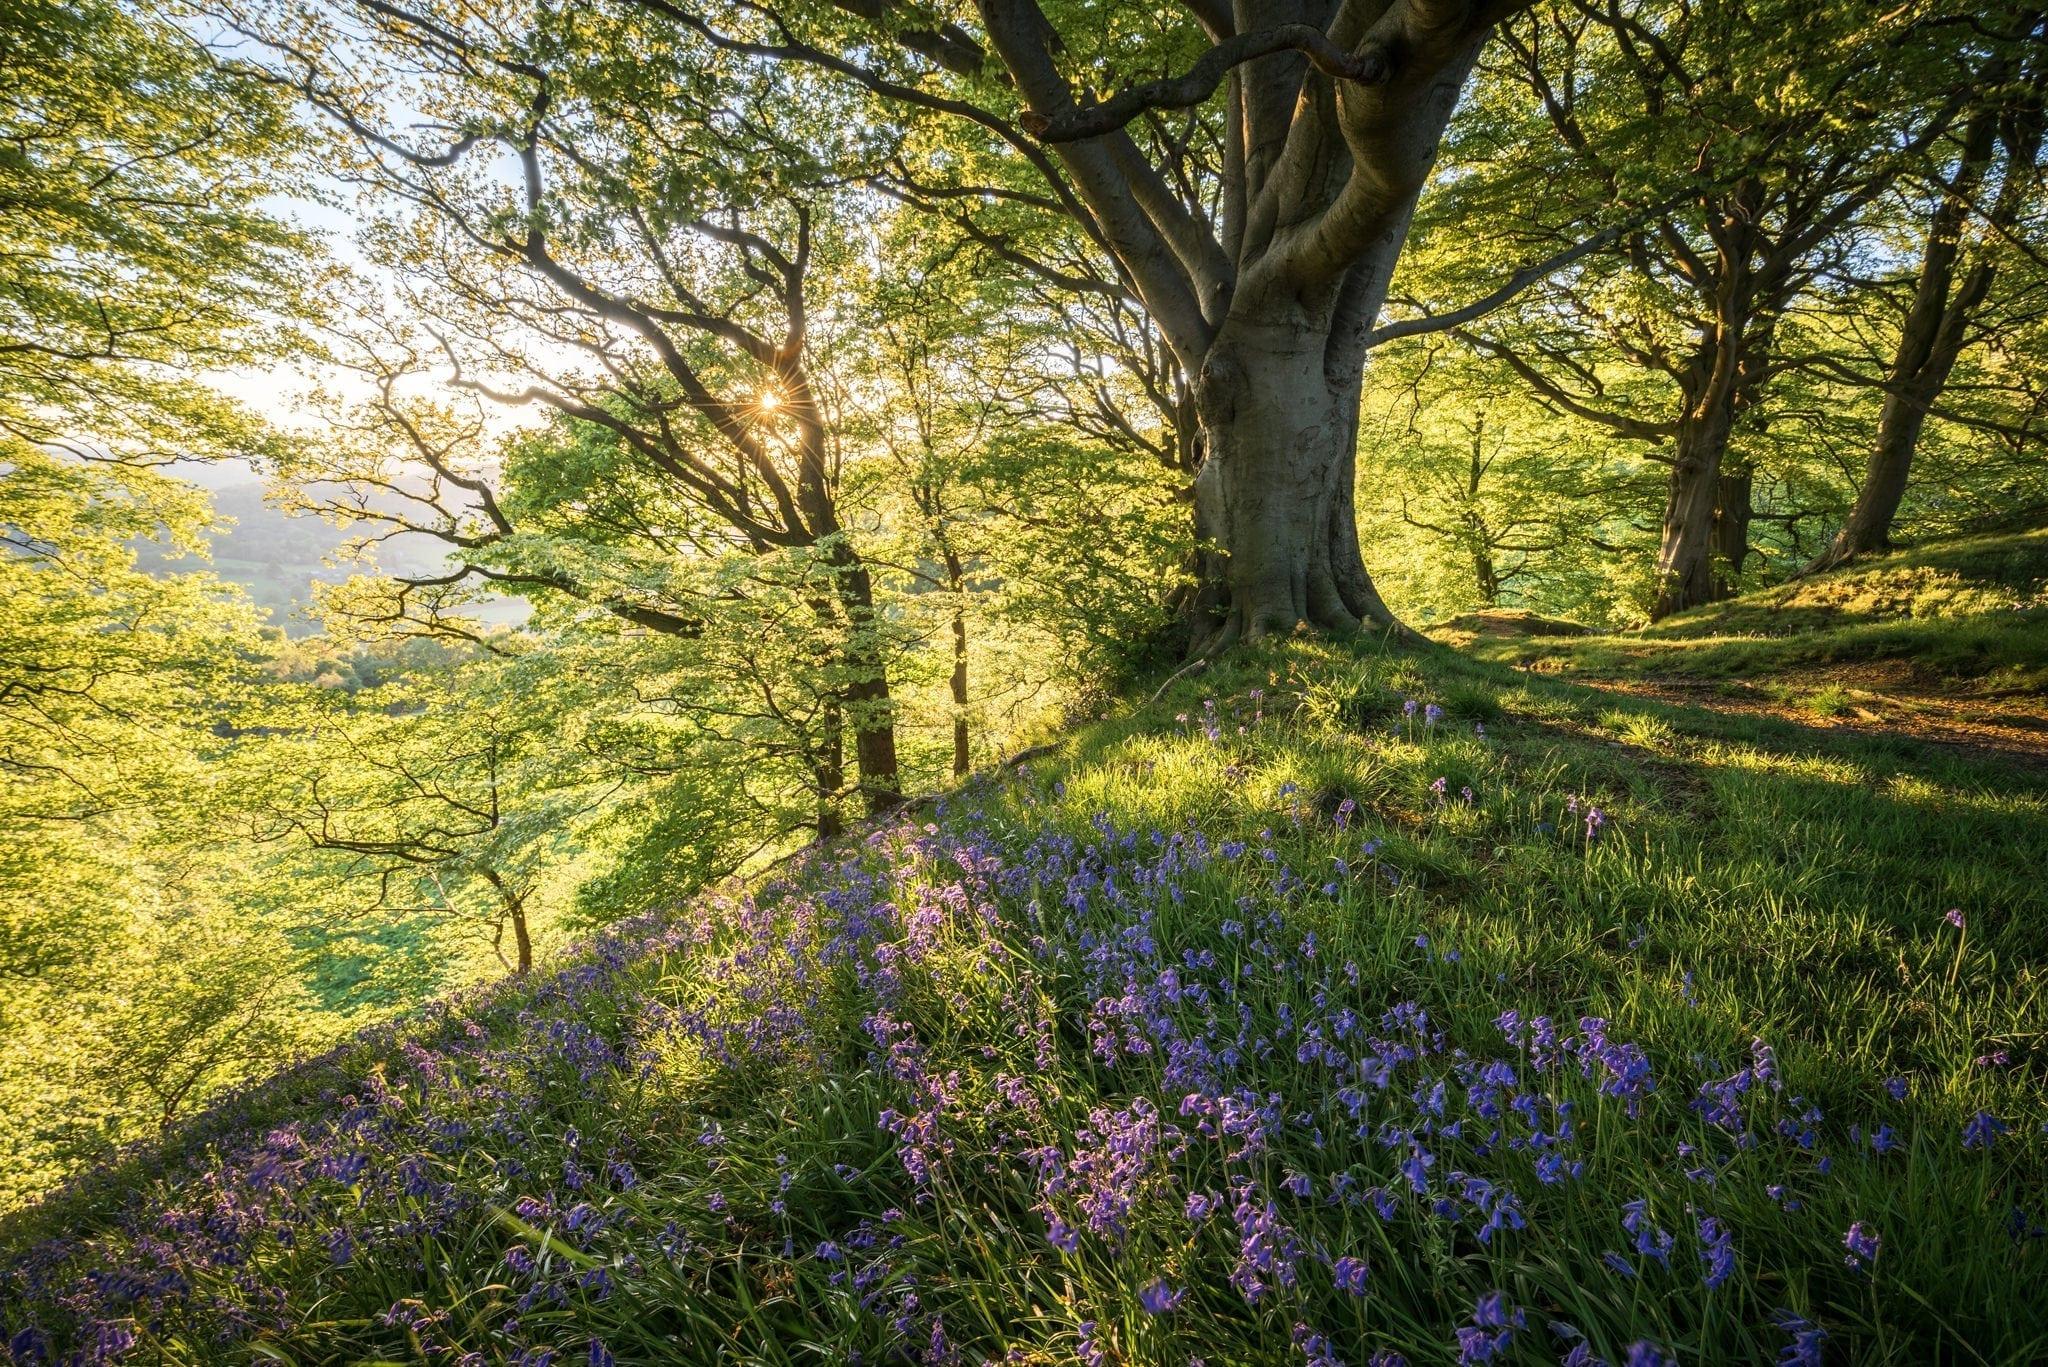 Bow Wood Bluebells Sunset - Bluebells and Woodlands Photography Workshop